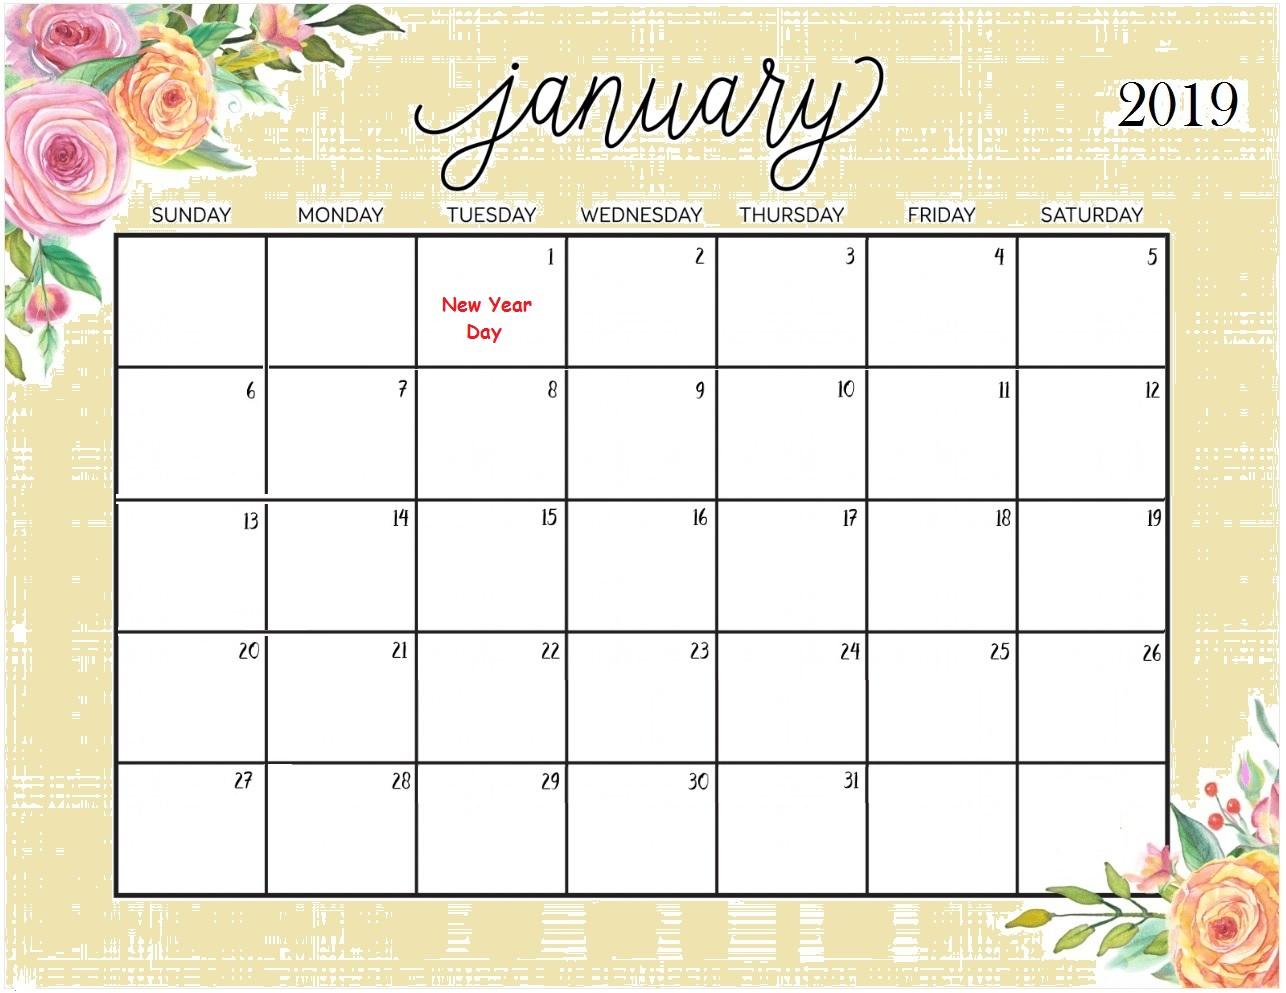 January 2019 Blank Calendar Template